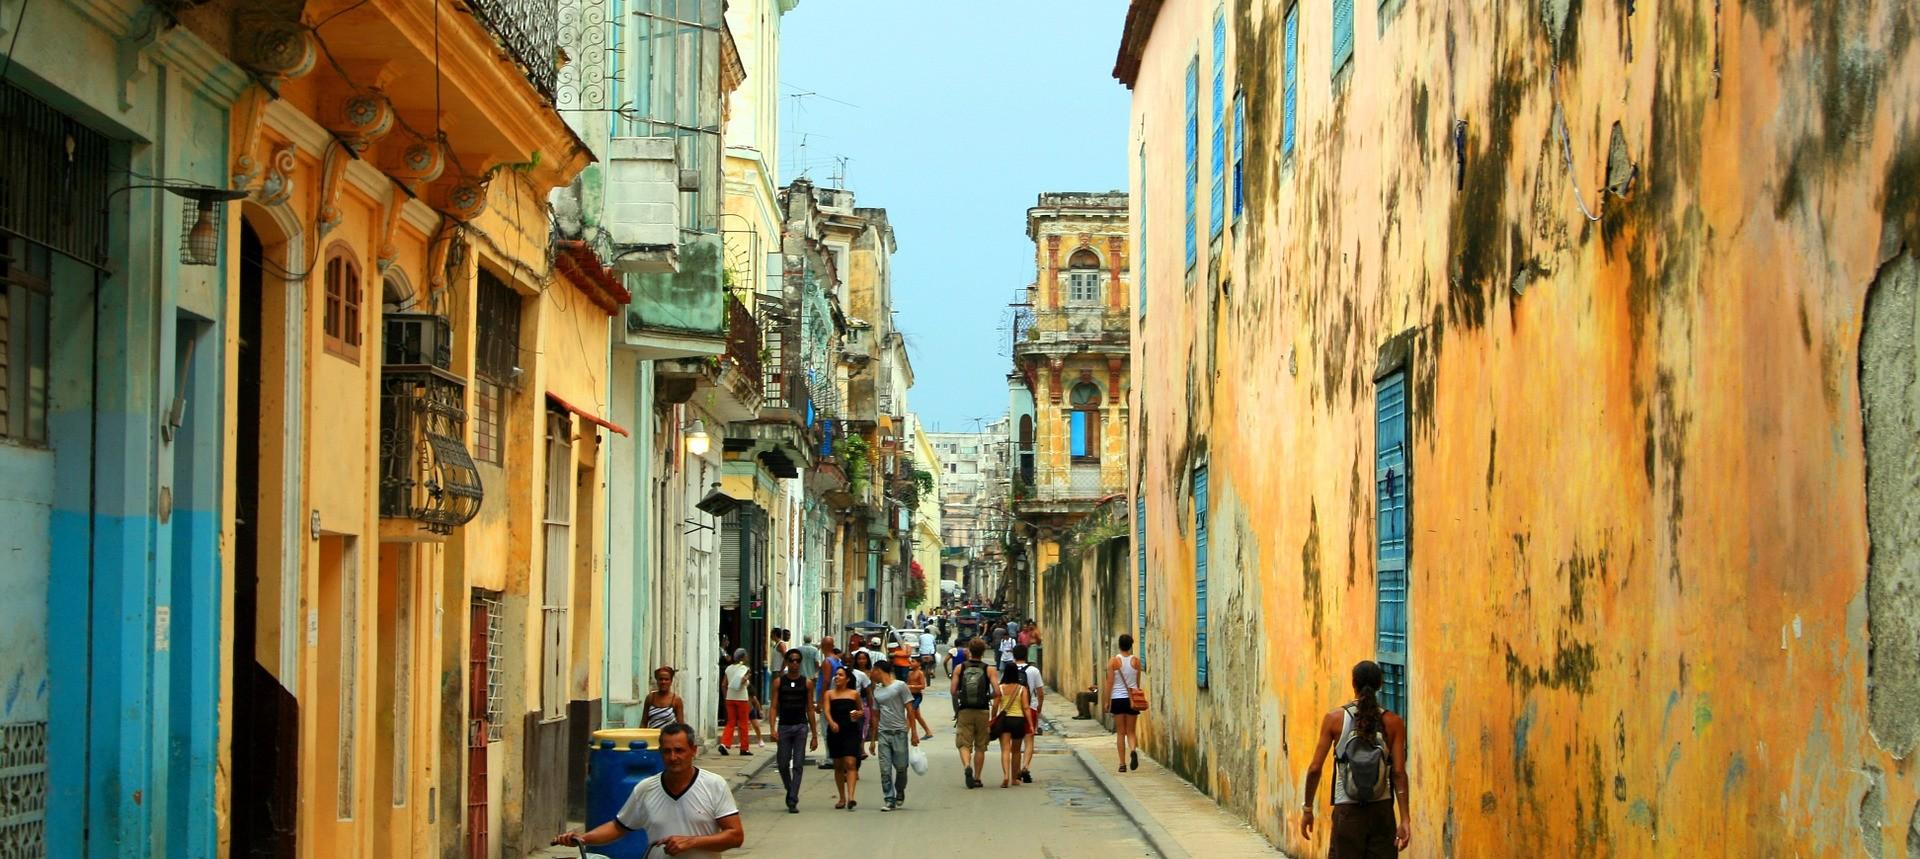 Cuba Air Bnb Havana Streets Daily Cuba Das Kuba Magazin